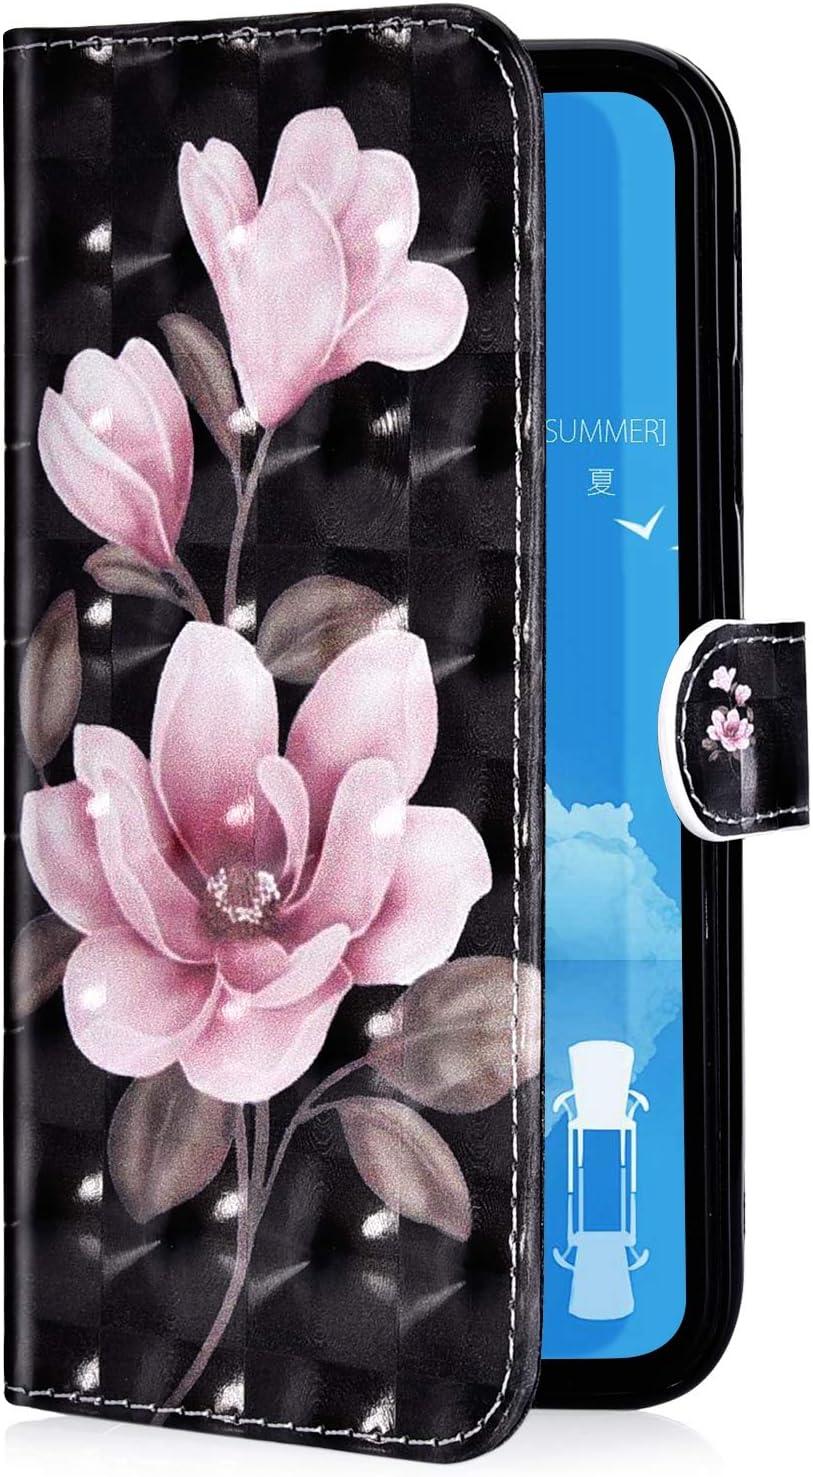 Felfy Kompatibel mit Galaxy A20e H/ülle,Kompatibel mit Galaxy A20e Case Magnetic Flip Case PU Leder Handyh/ülle Schutzh/ülle Klapph/ülle Bunt Muster Tasche Lederh/ülle mit Kartenf/ächer und Standfunktion